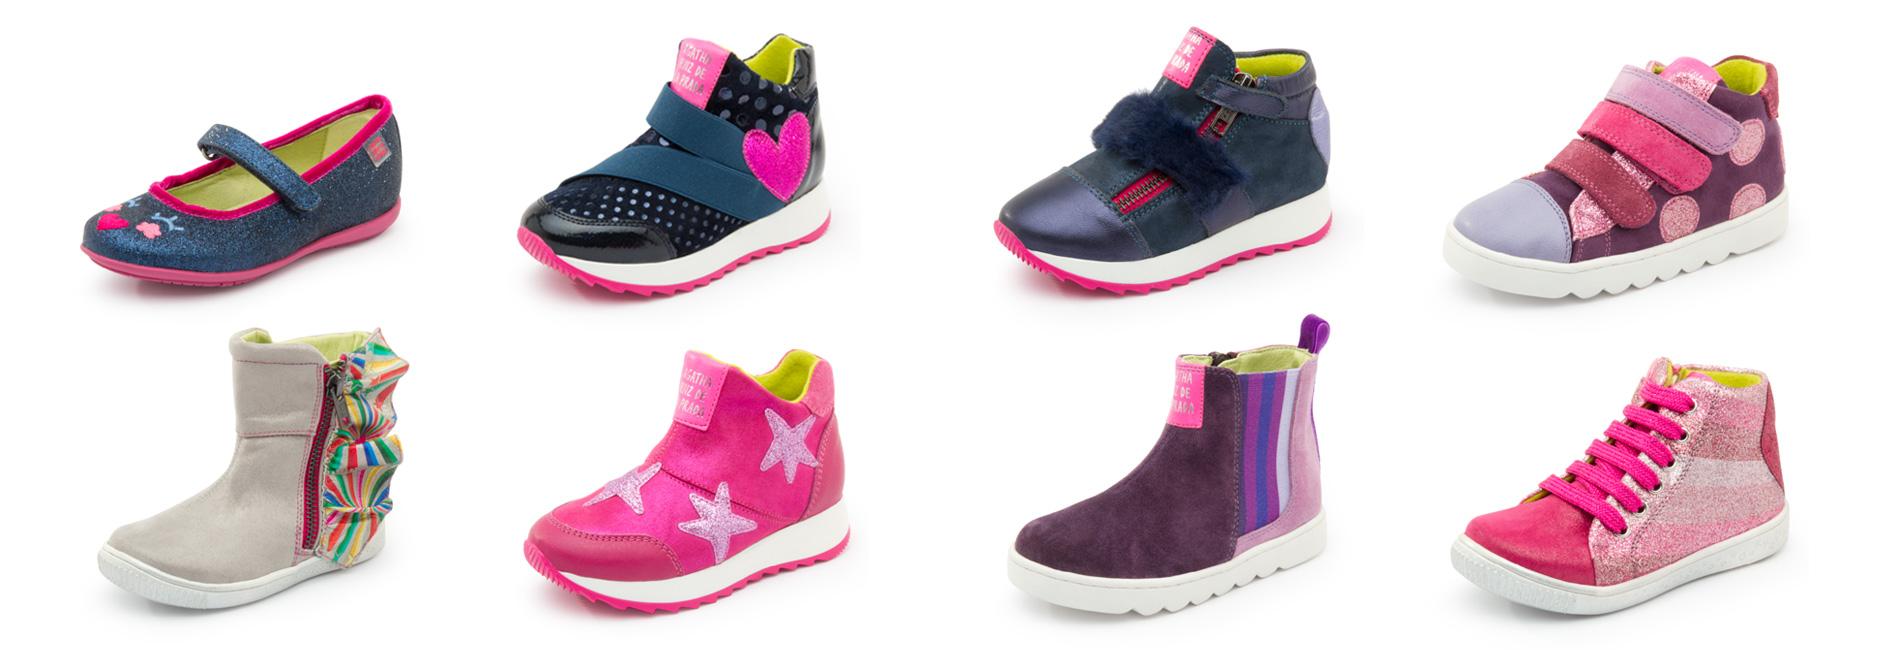 Slider-fotocommerce-2018-calzado-agatha